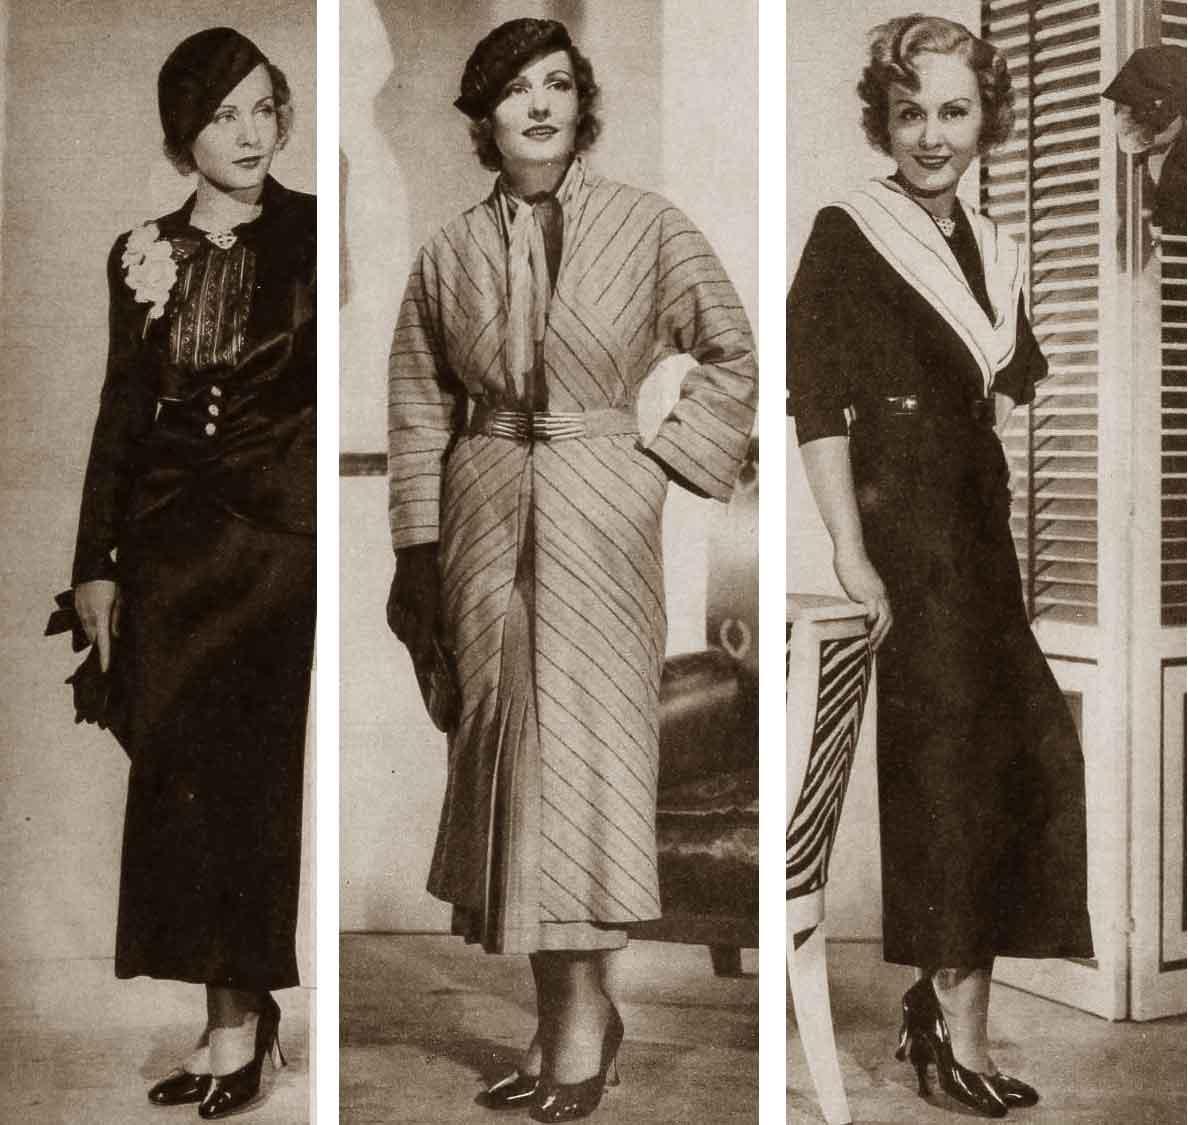 Wedding Fashion History Photos Weddings Dress Groups 1930 s fashion photos